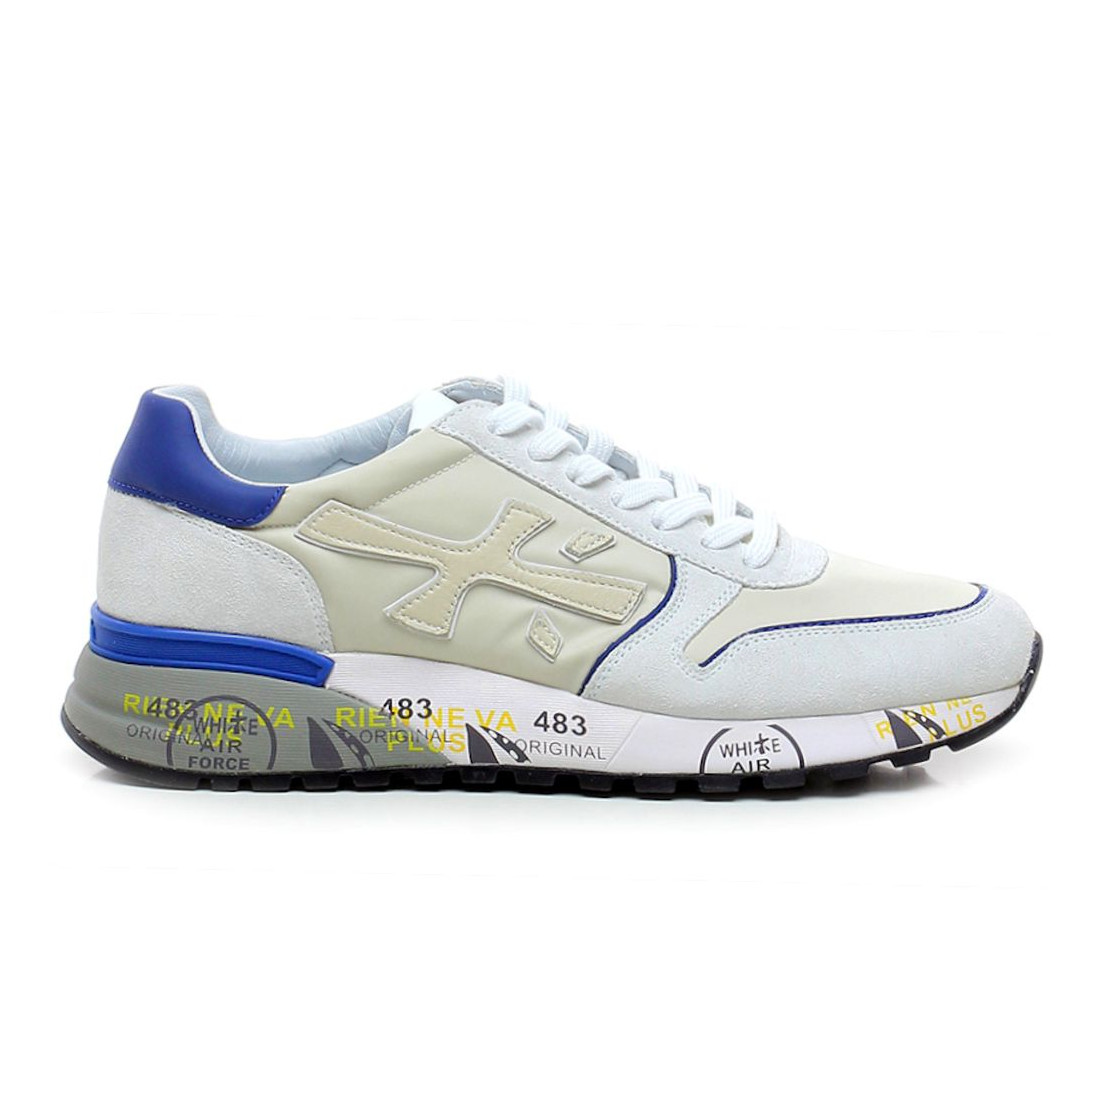 sneakers uomo premiata mick5192 8254